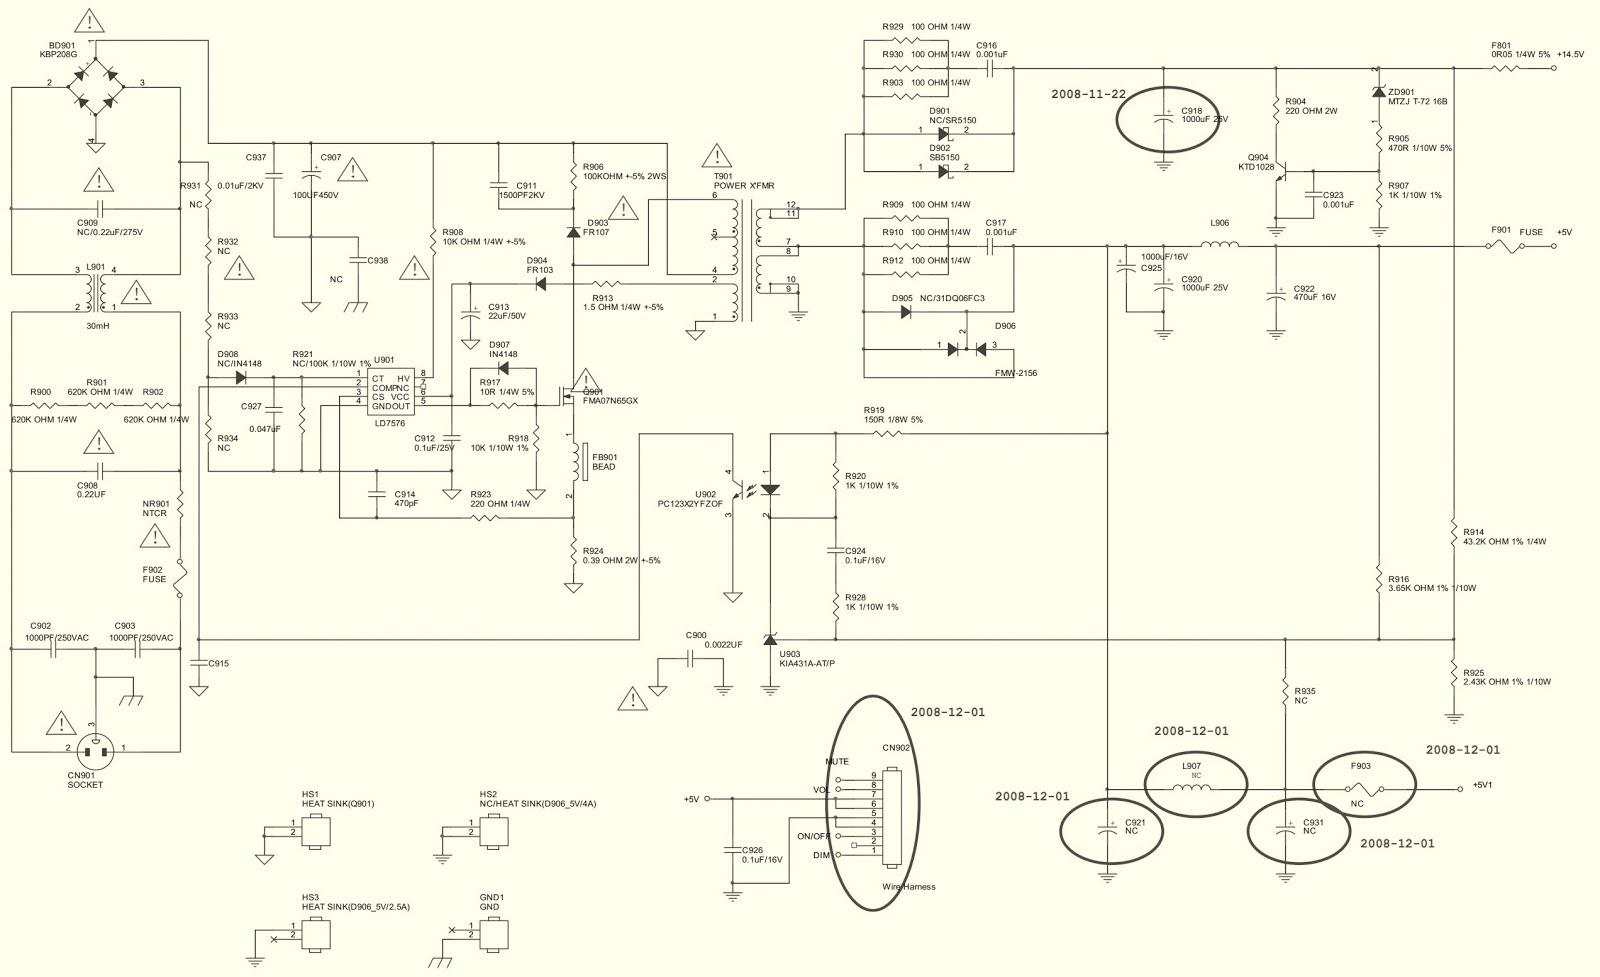 hight resolution of aoc2236vwa lcd monitor circuit diagram 7155g2892 power board dell lcd monitor schematic diagram lcd monitor schematic diagram